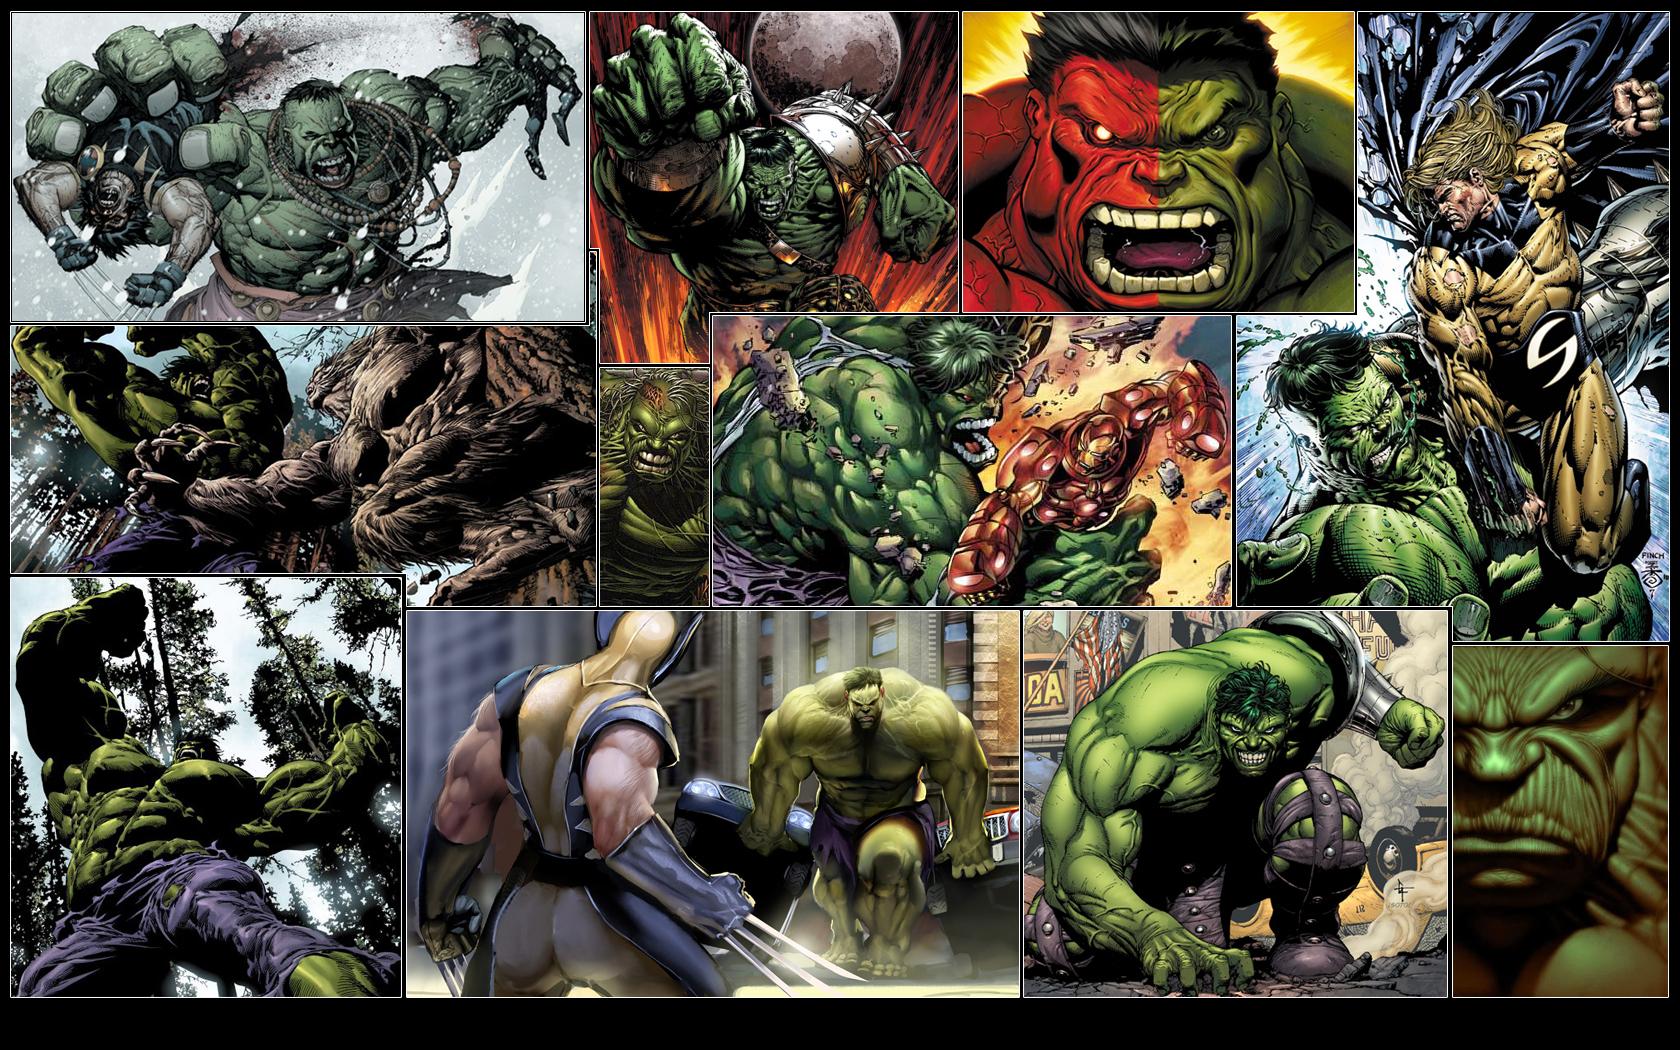 Hulk Computer Wallpapers Desktop Backgrounds 1680x1050